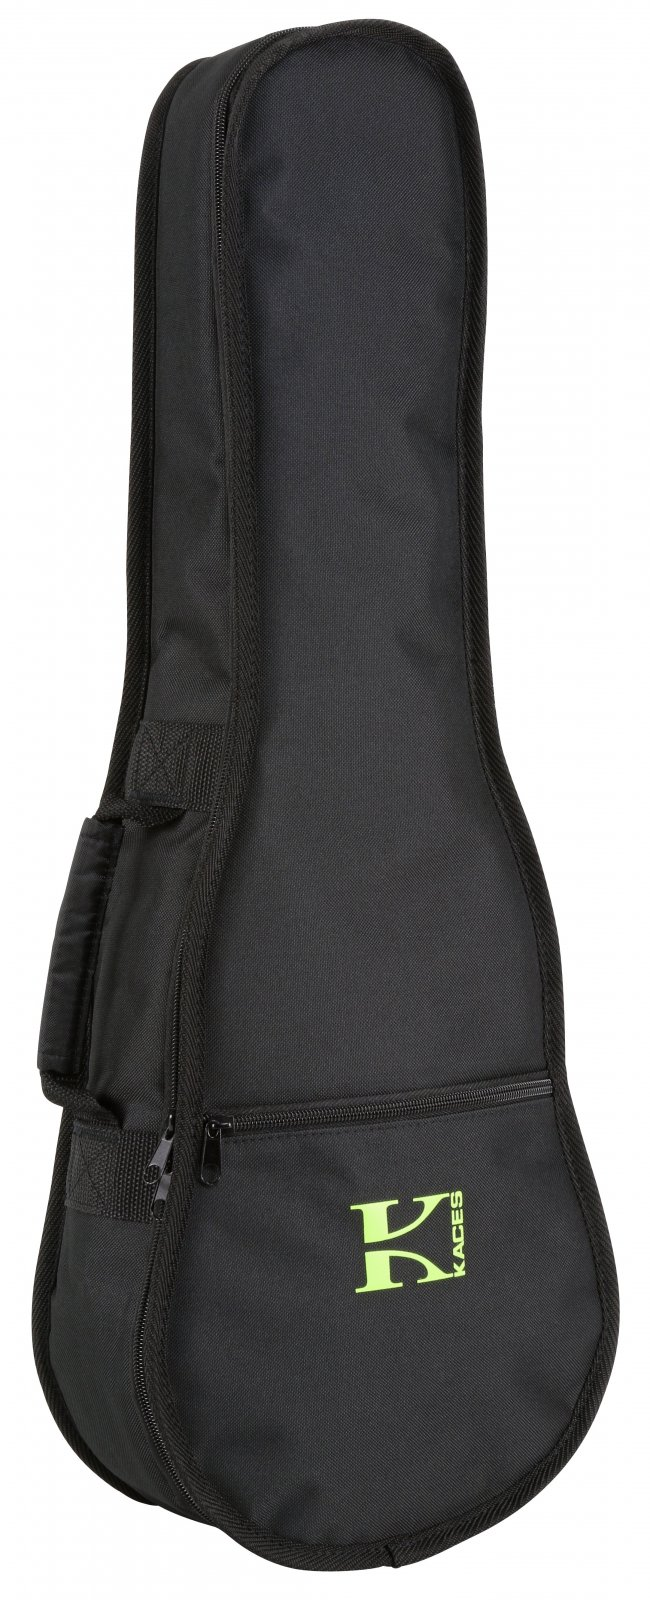 Kaces Xpress Concert Size Ukulele Bag